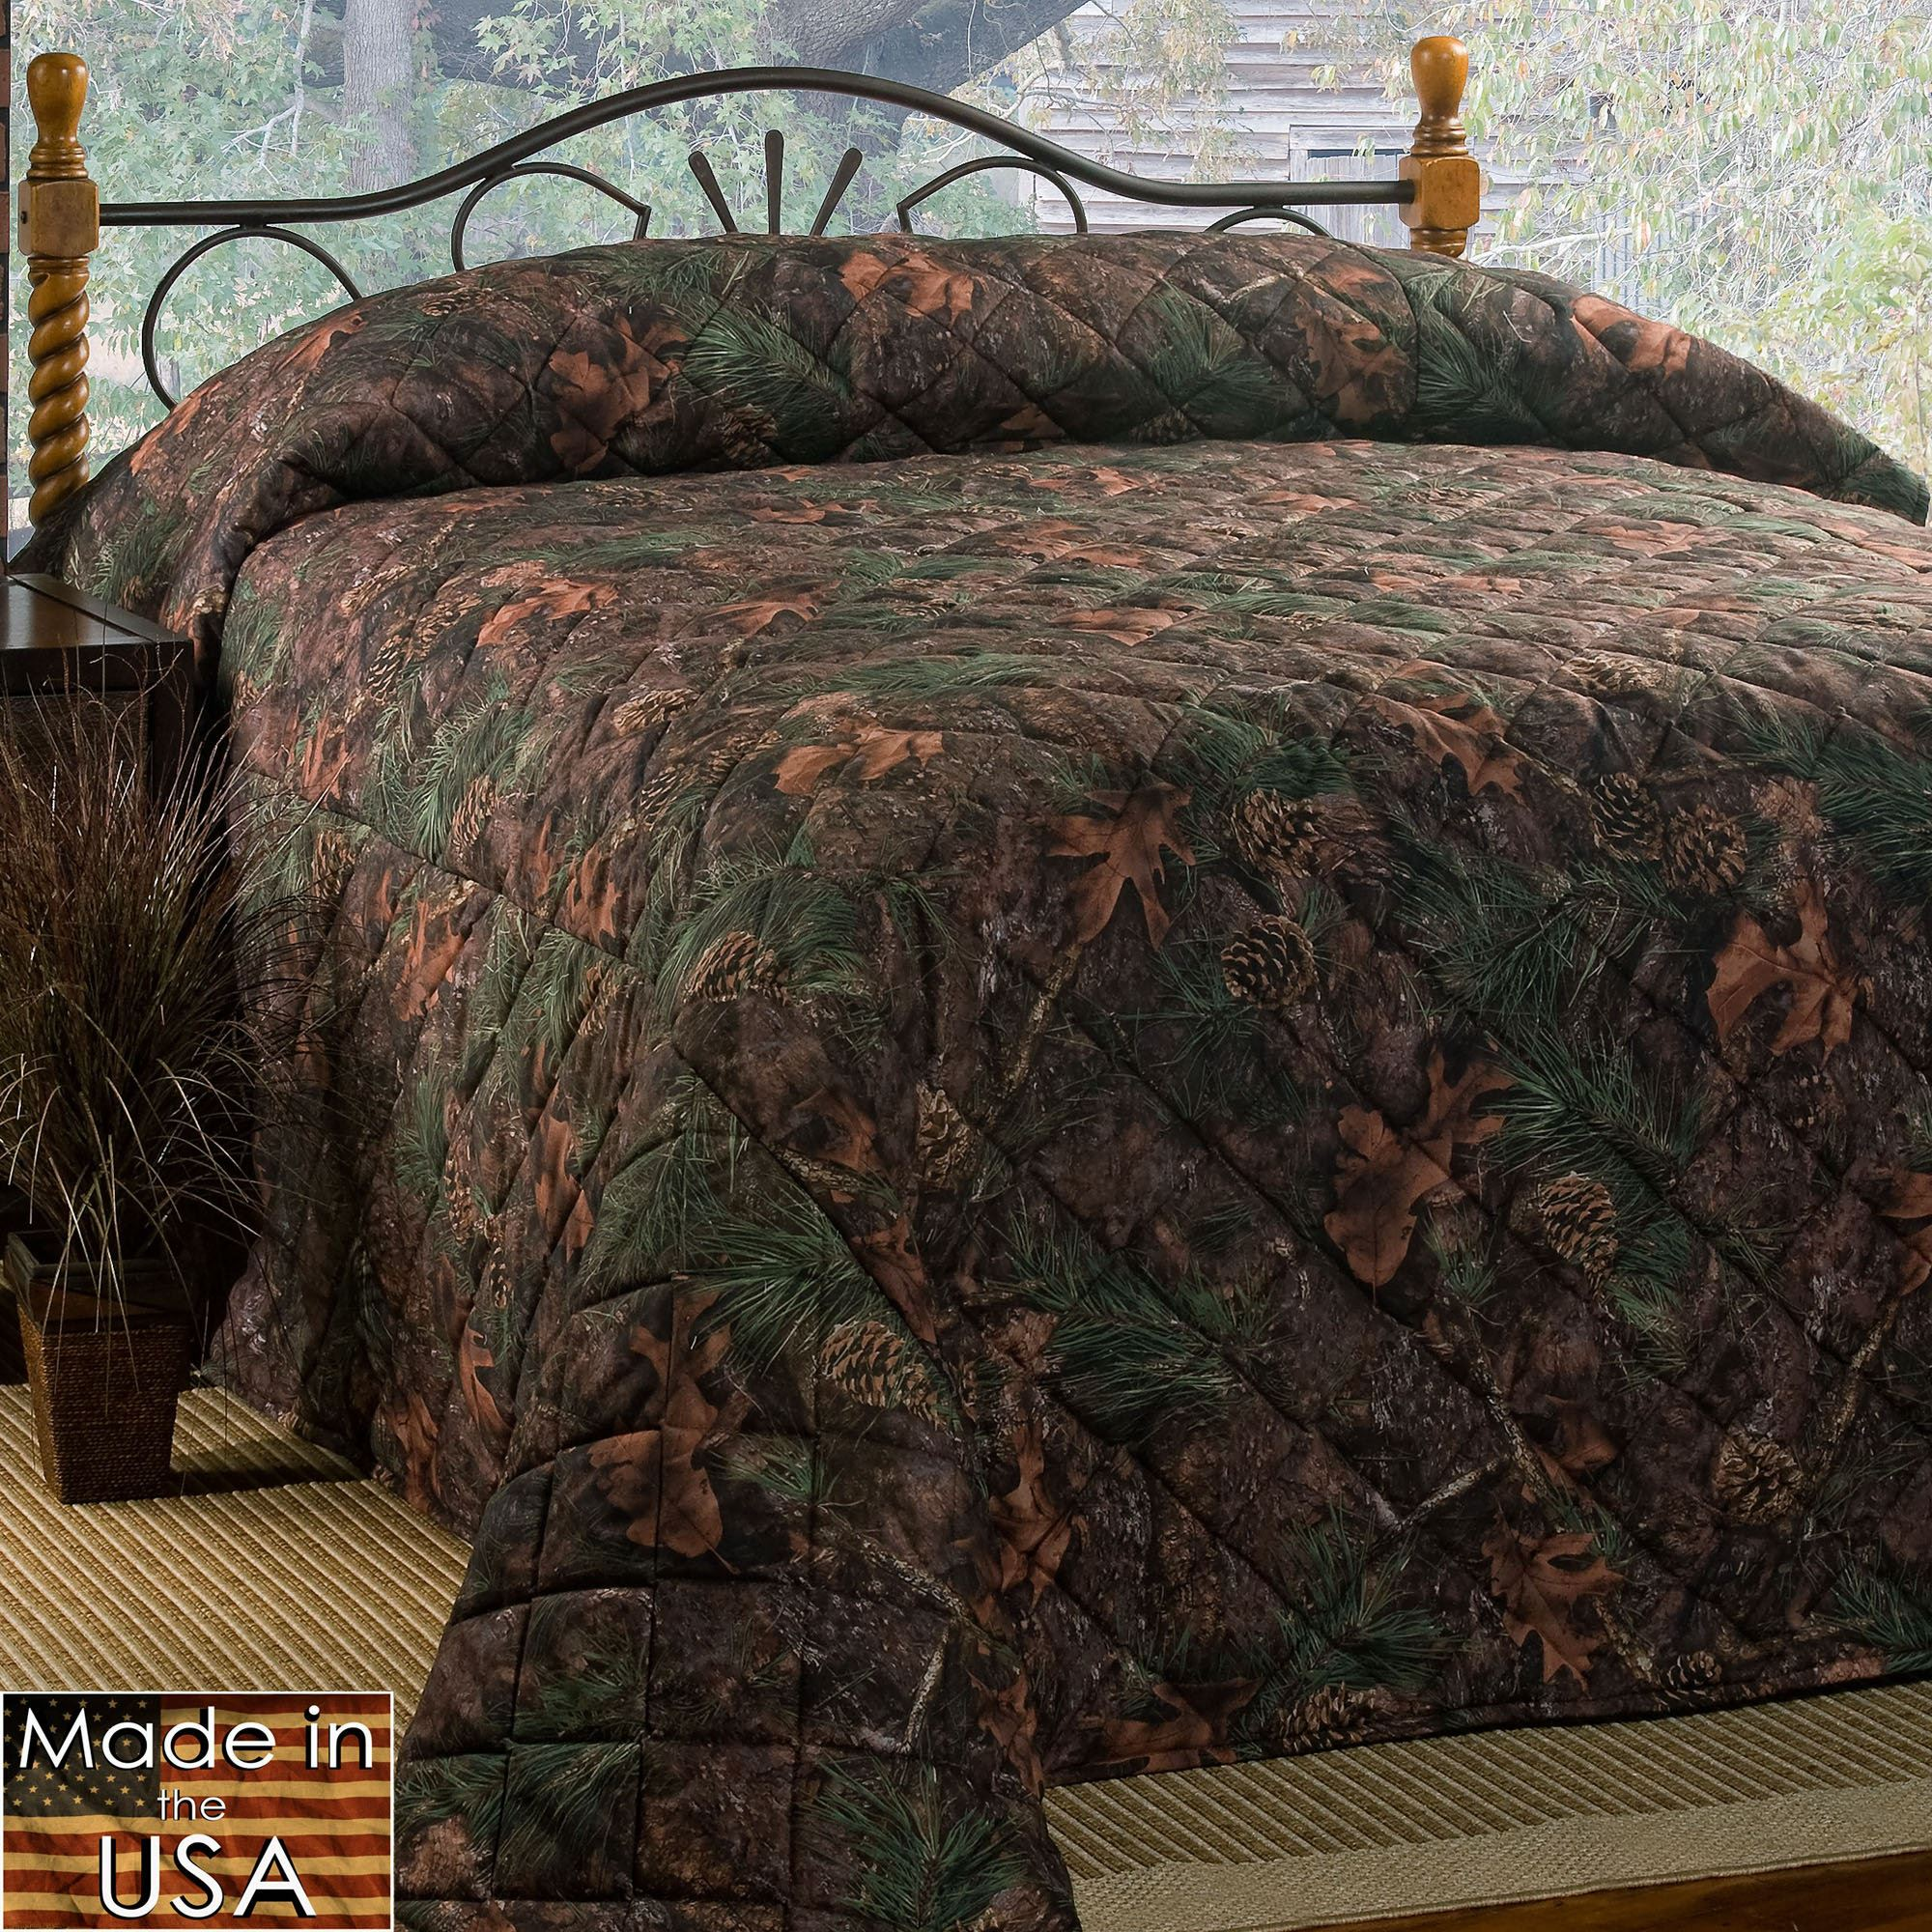 Mixed Pine Rustic Camo Quilted Bedspread Bedding : camo quilt bedding - Adamdwight.com